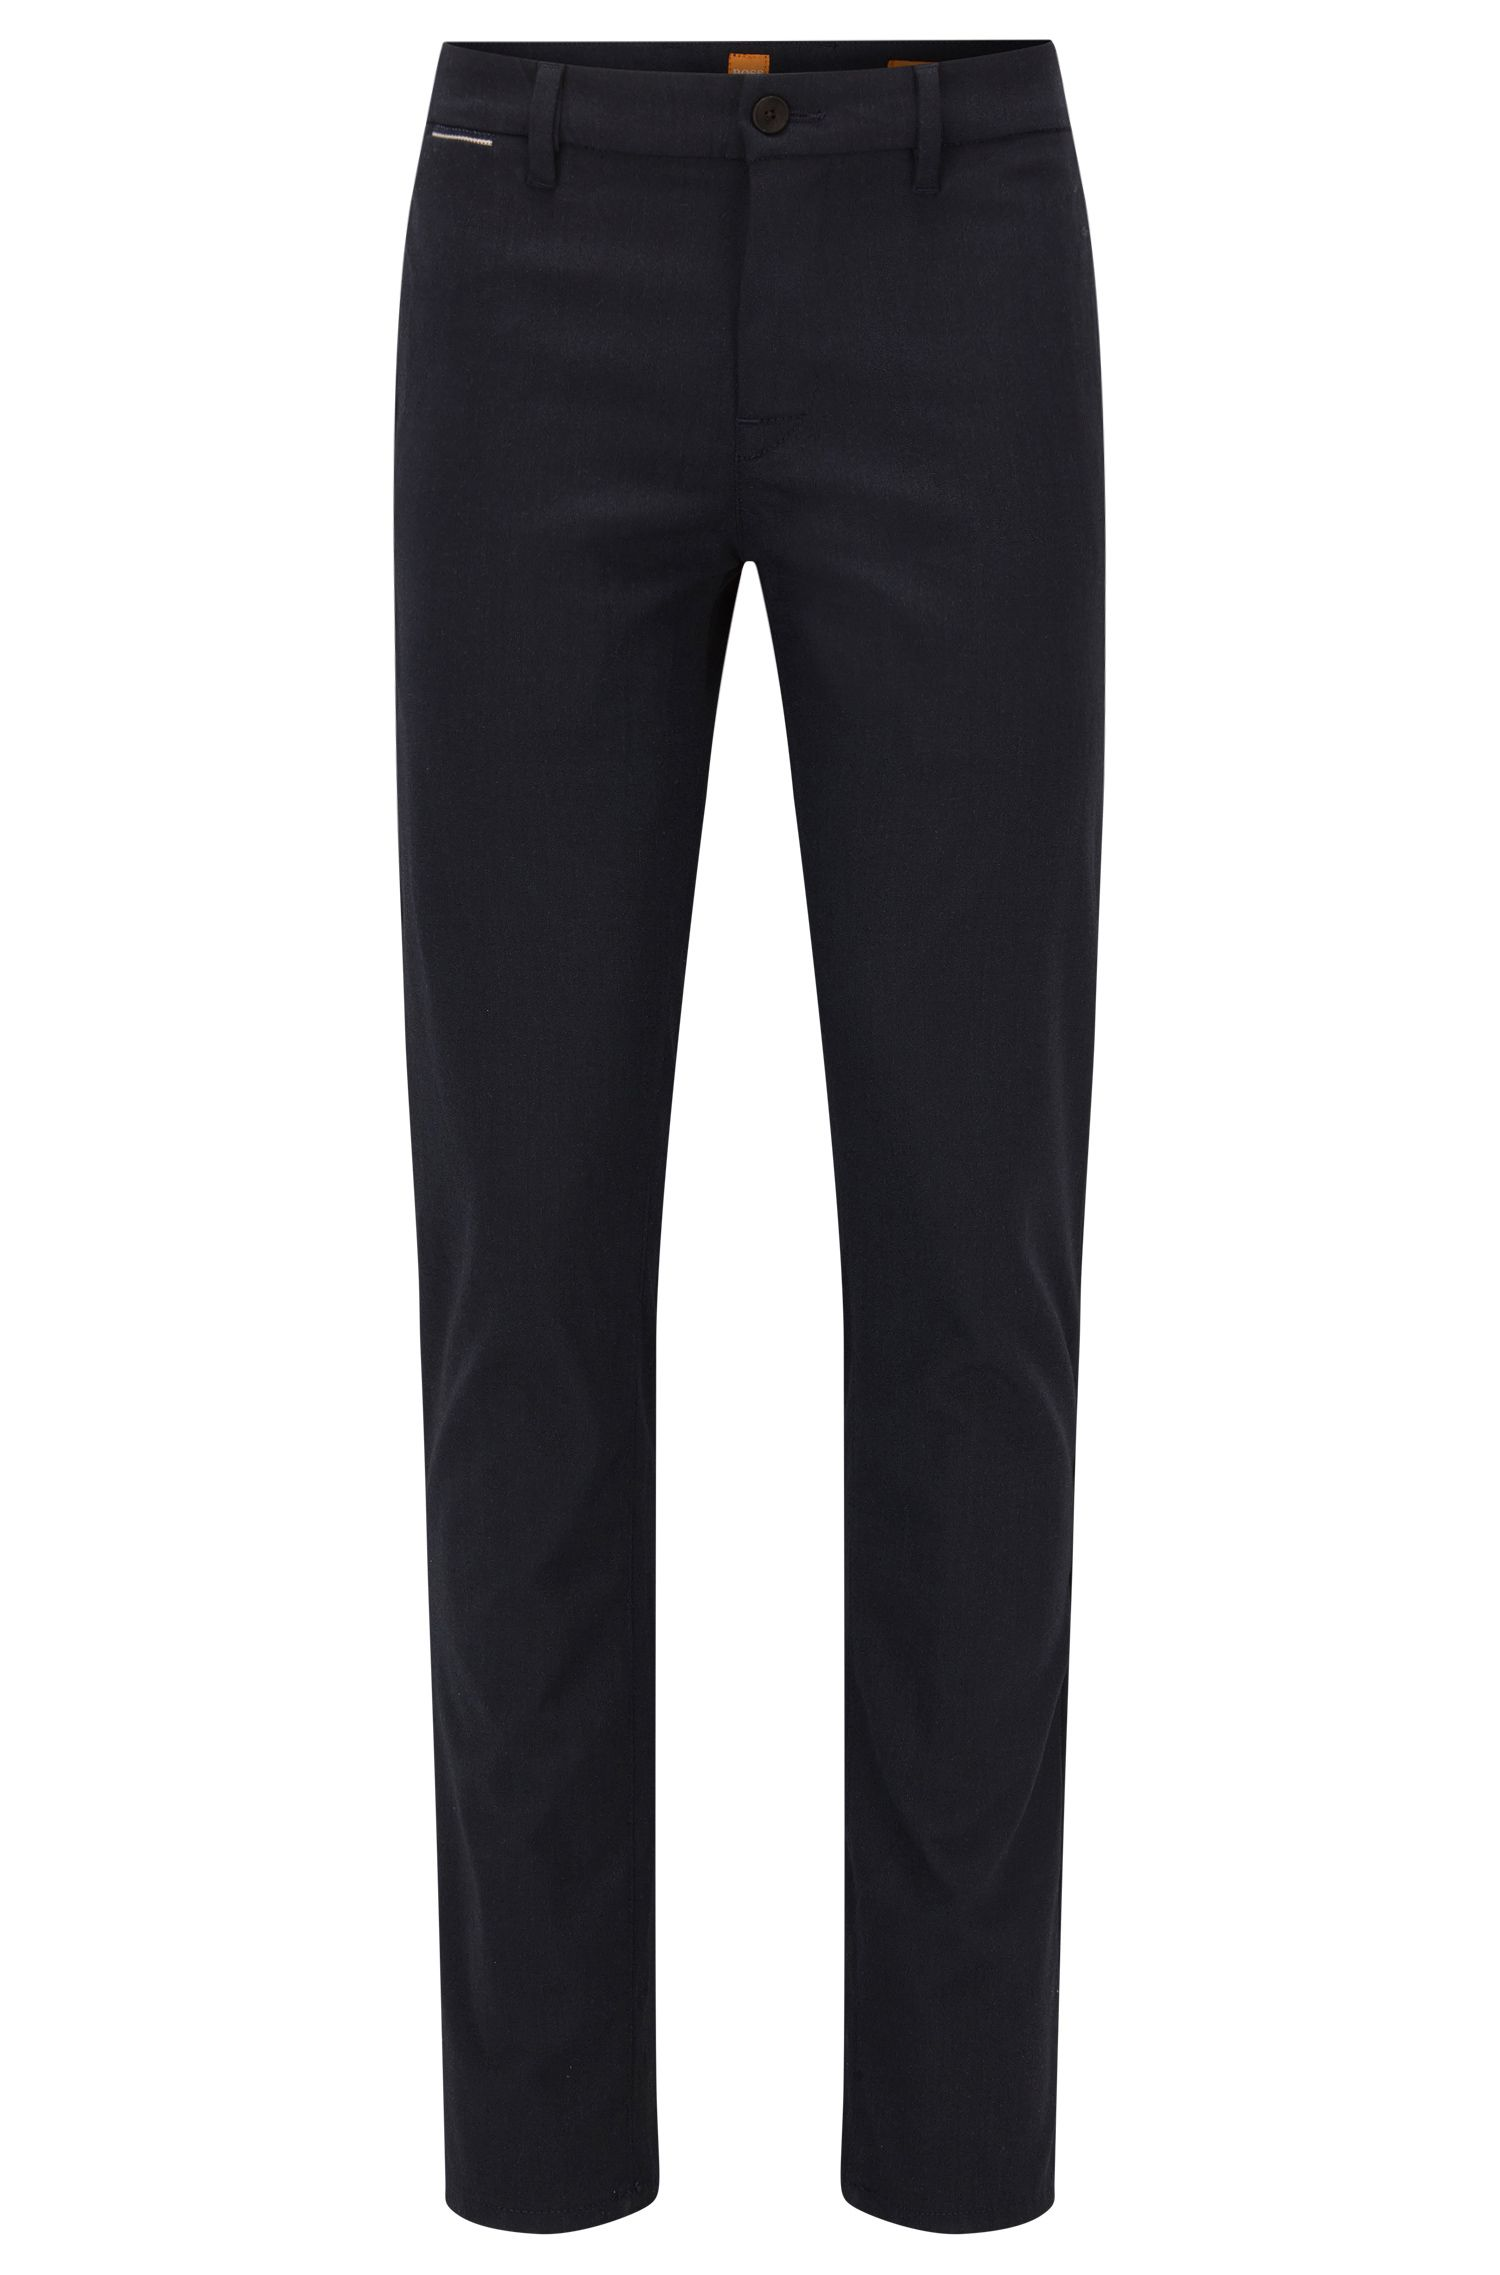 Pantaloni slim fit in tessuto Oxford mélange